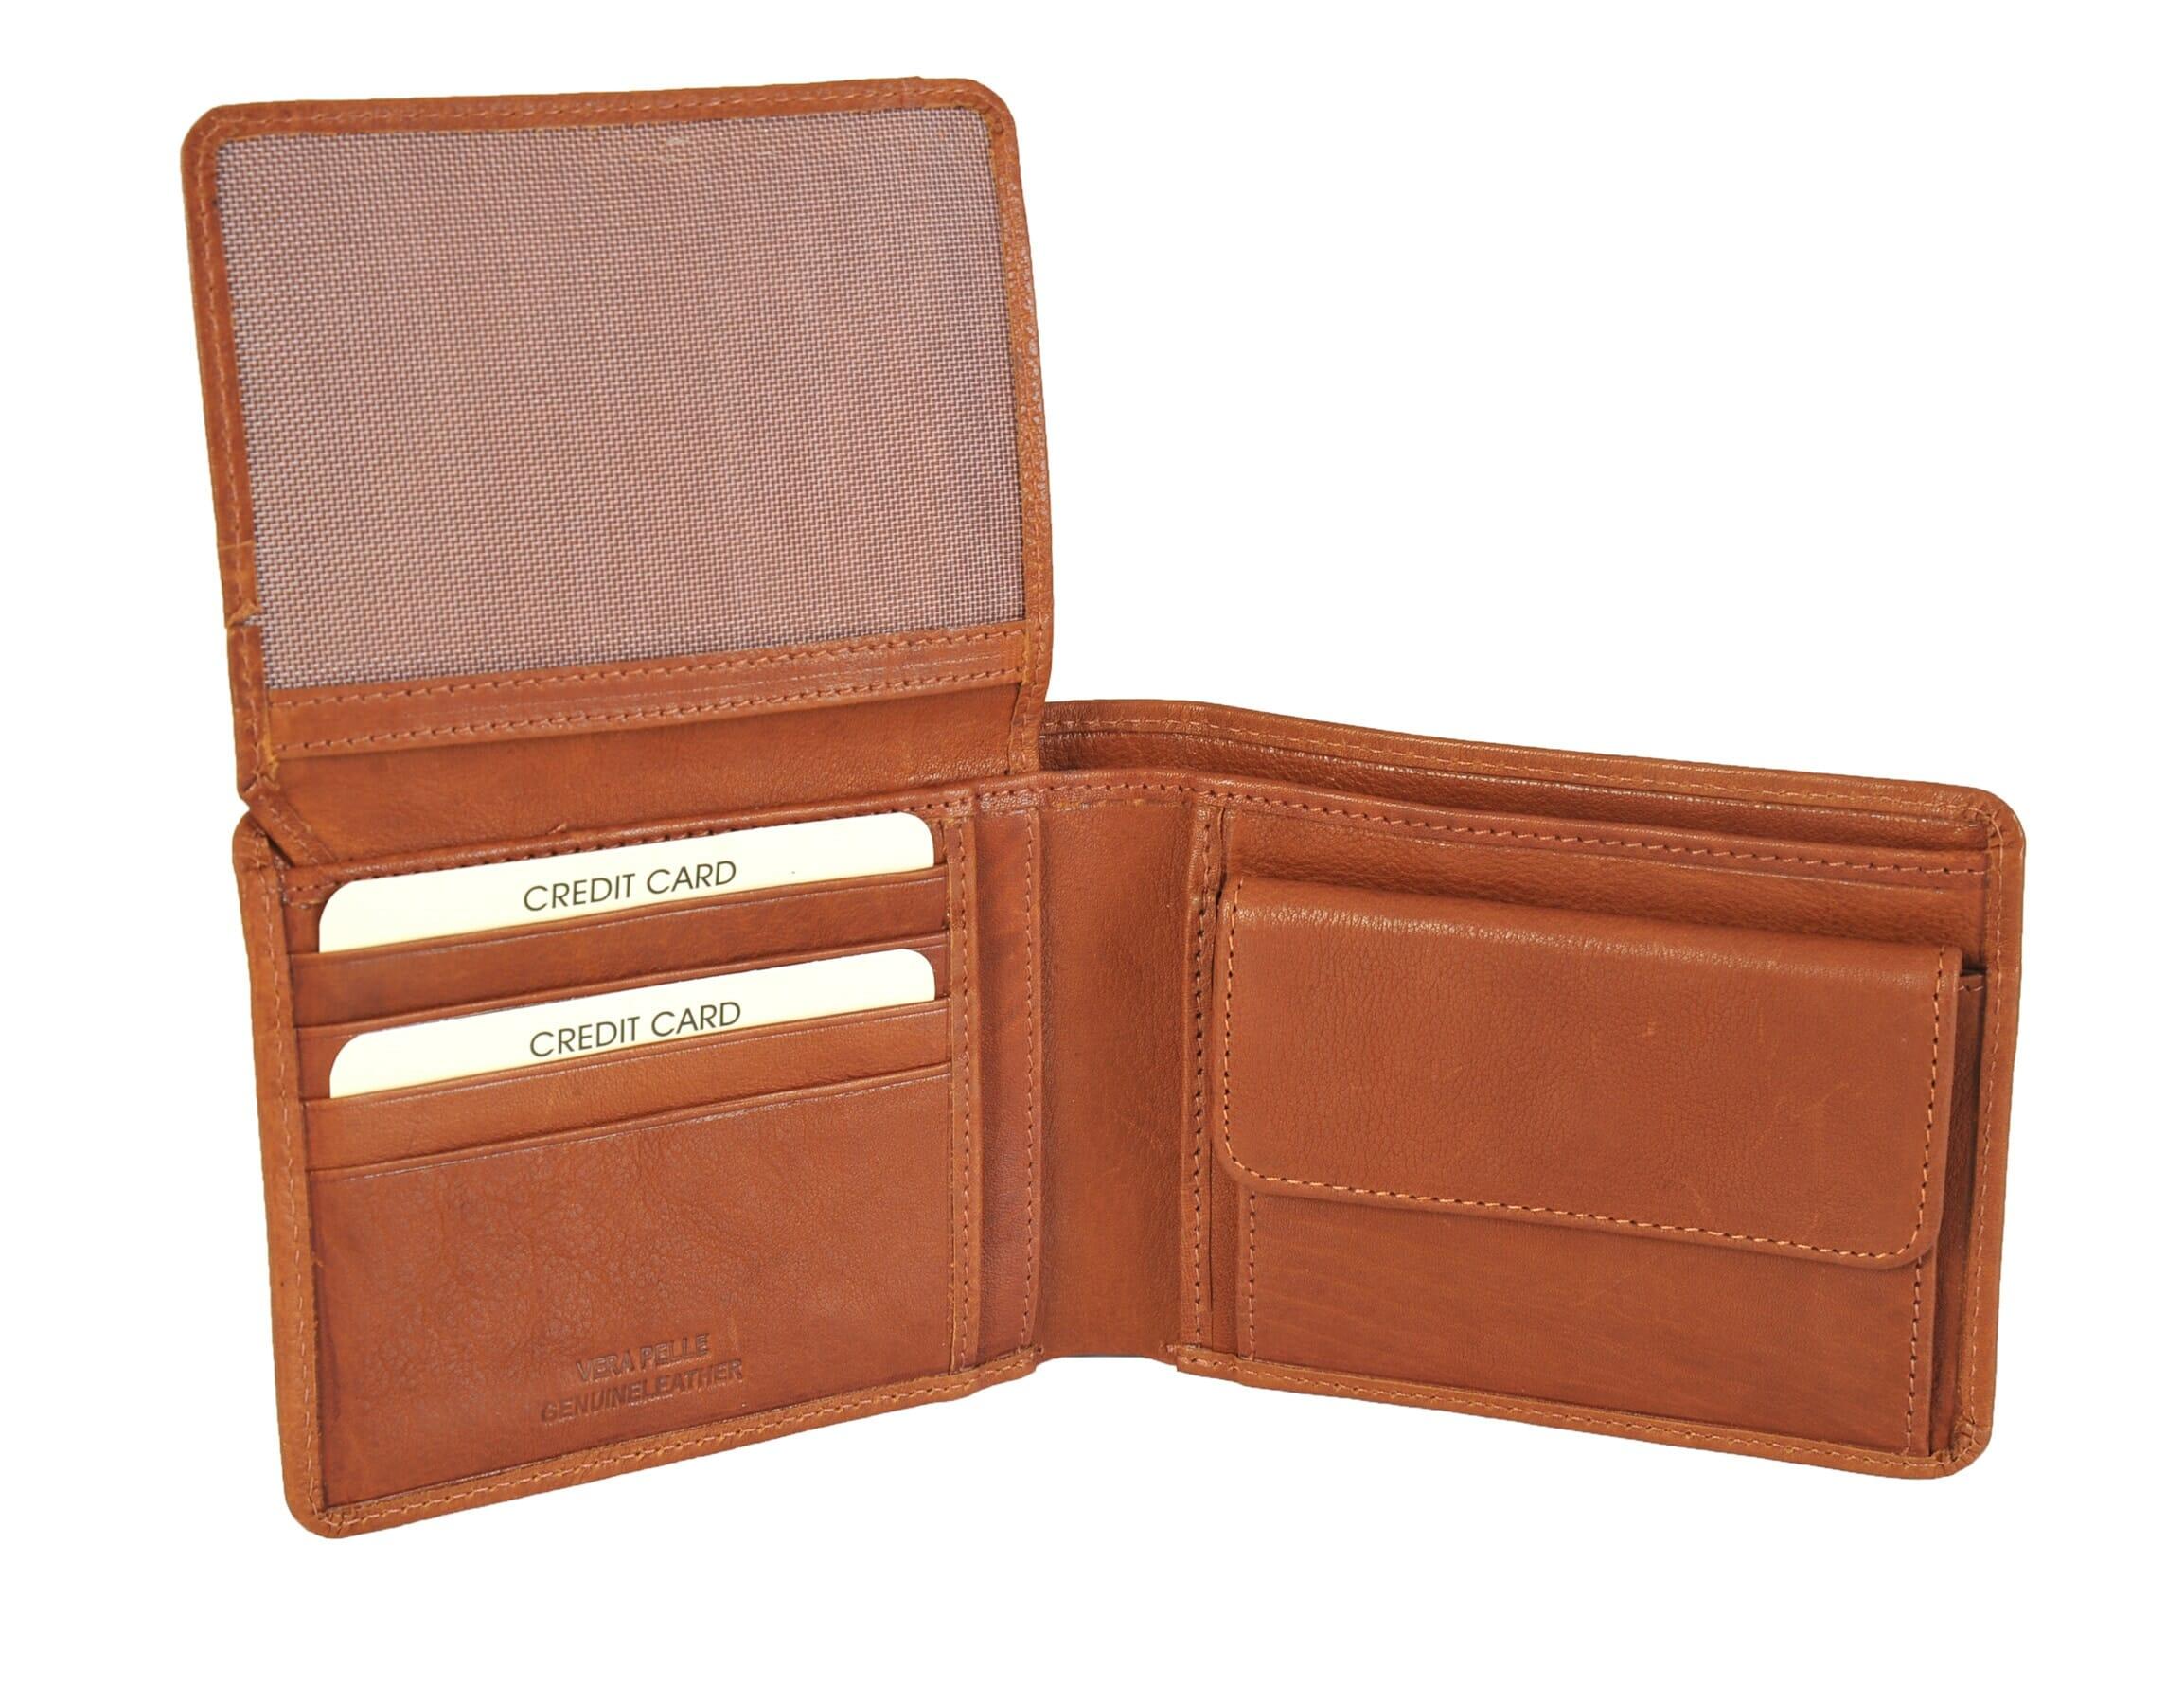 94e499c578f Gianni Conti Fine Italian Tan Soft Leather Bifold Wallet 1527100 ...